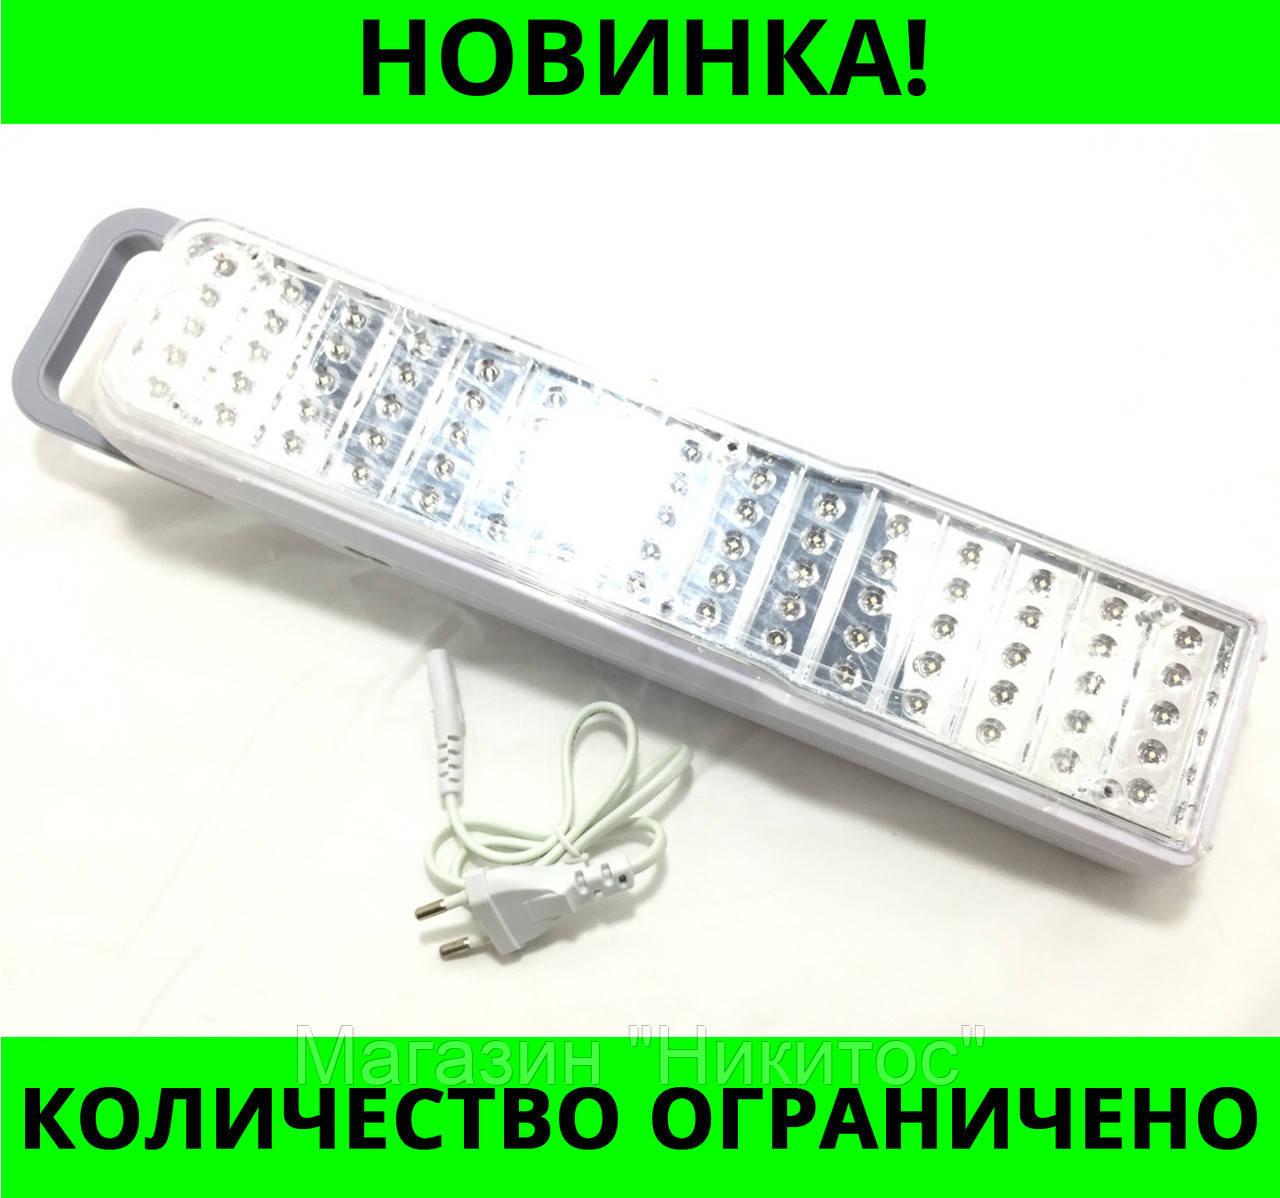 LED лампа Kamisafe KM-773 (75 диодов)!Розница и Опт